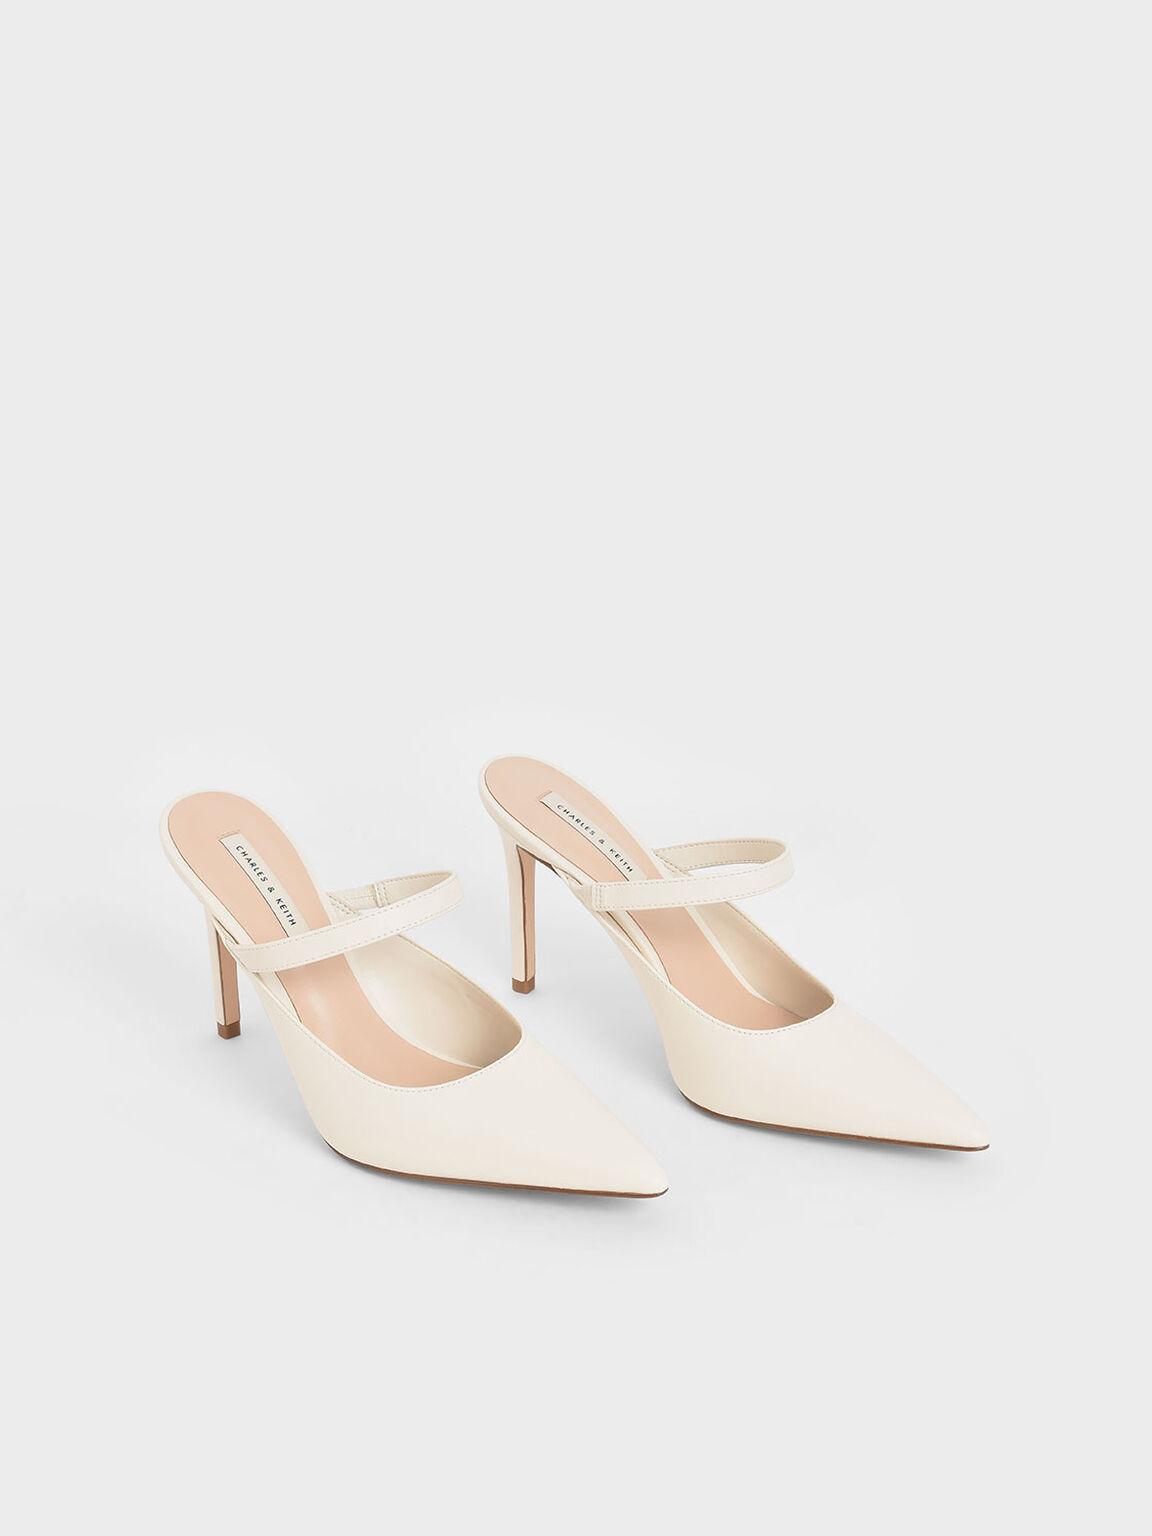 Mary Jane Stiletto Heel Mules, Chalk, hi-res